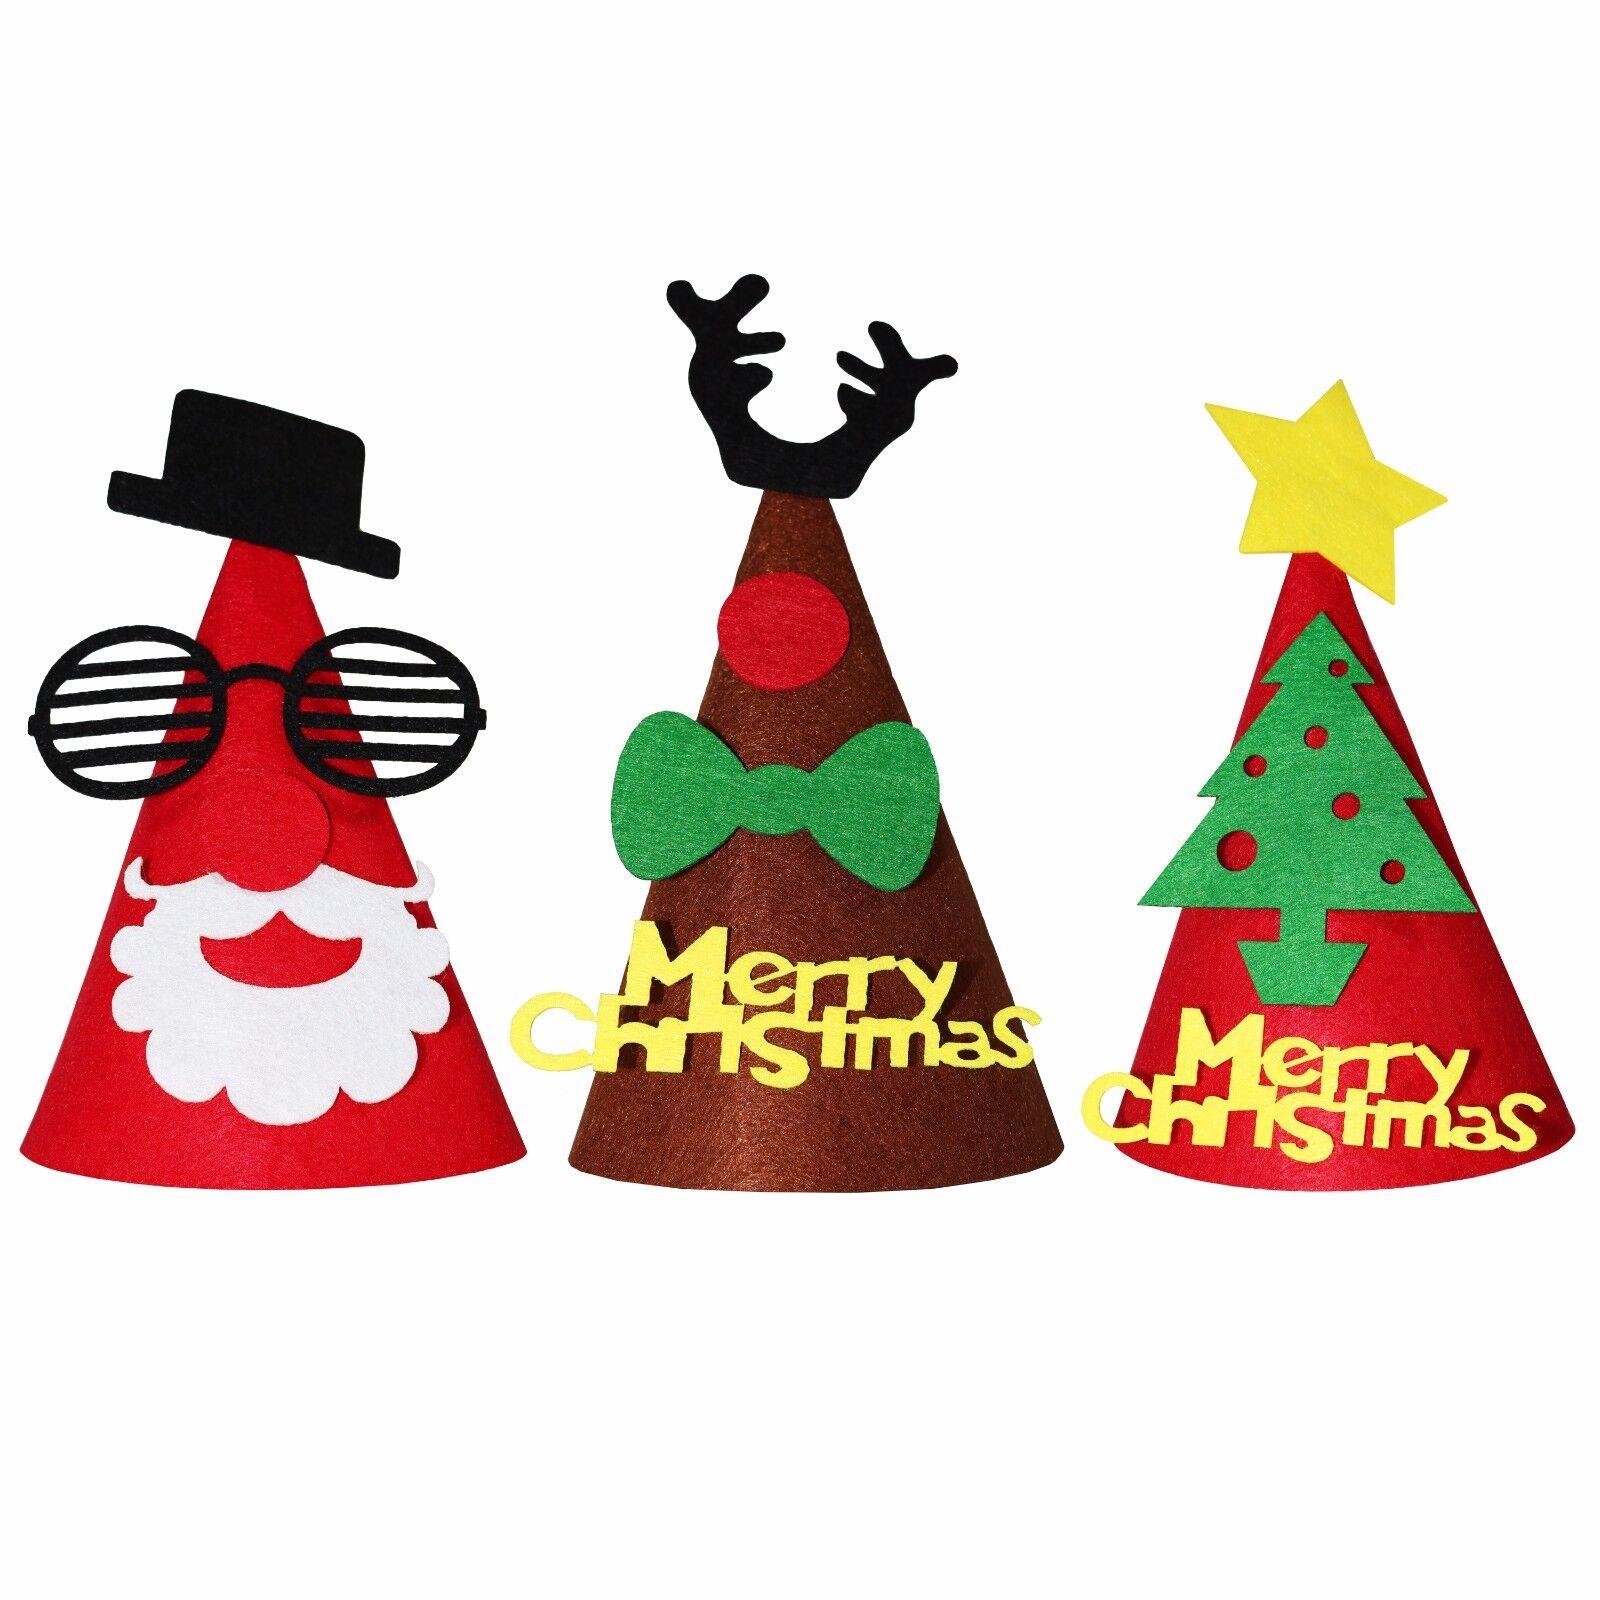 6 Christmas Xmas Novelty Felt Party Santa Elf Hats Fancy Dress With 3D STICKERS